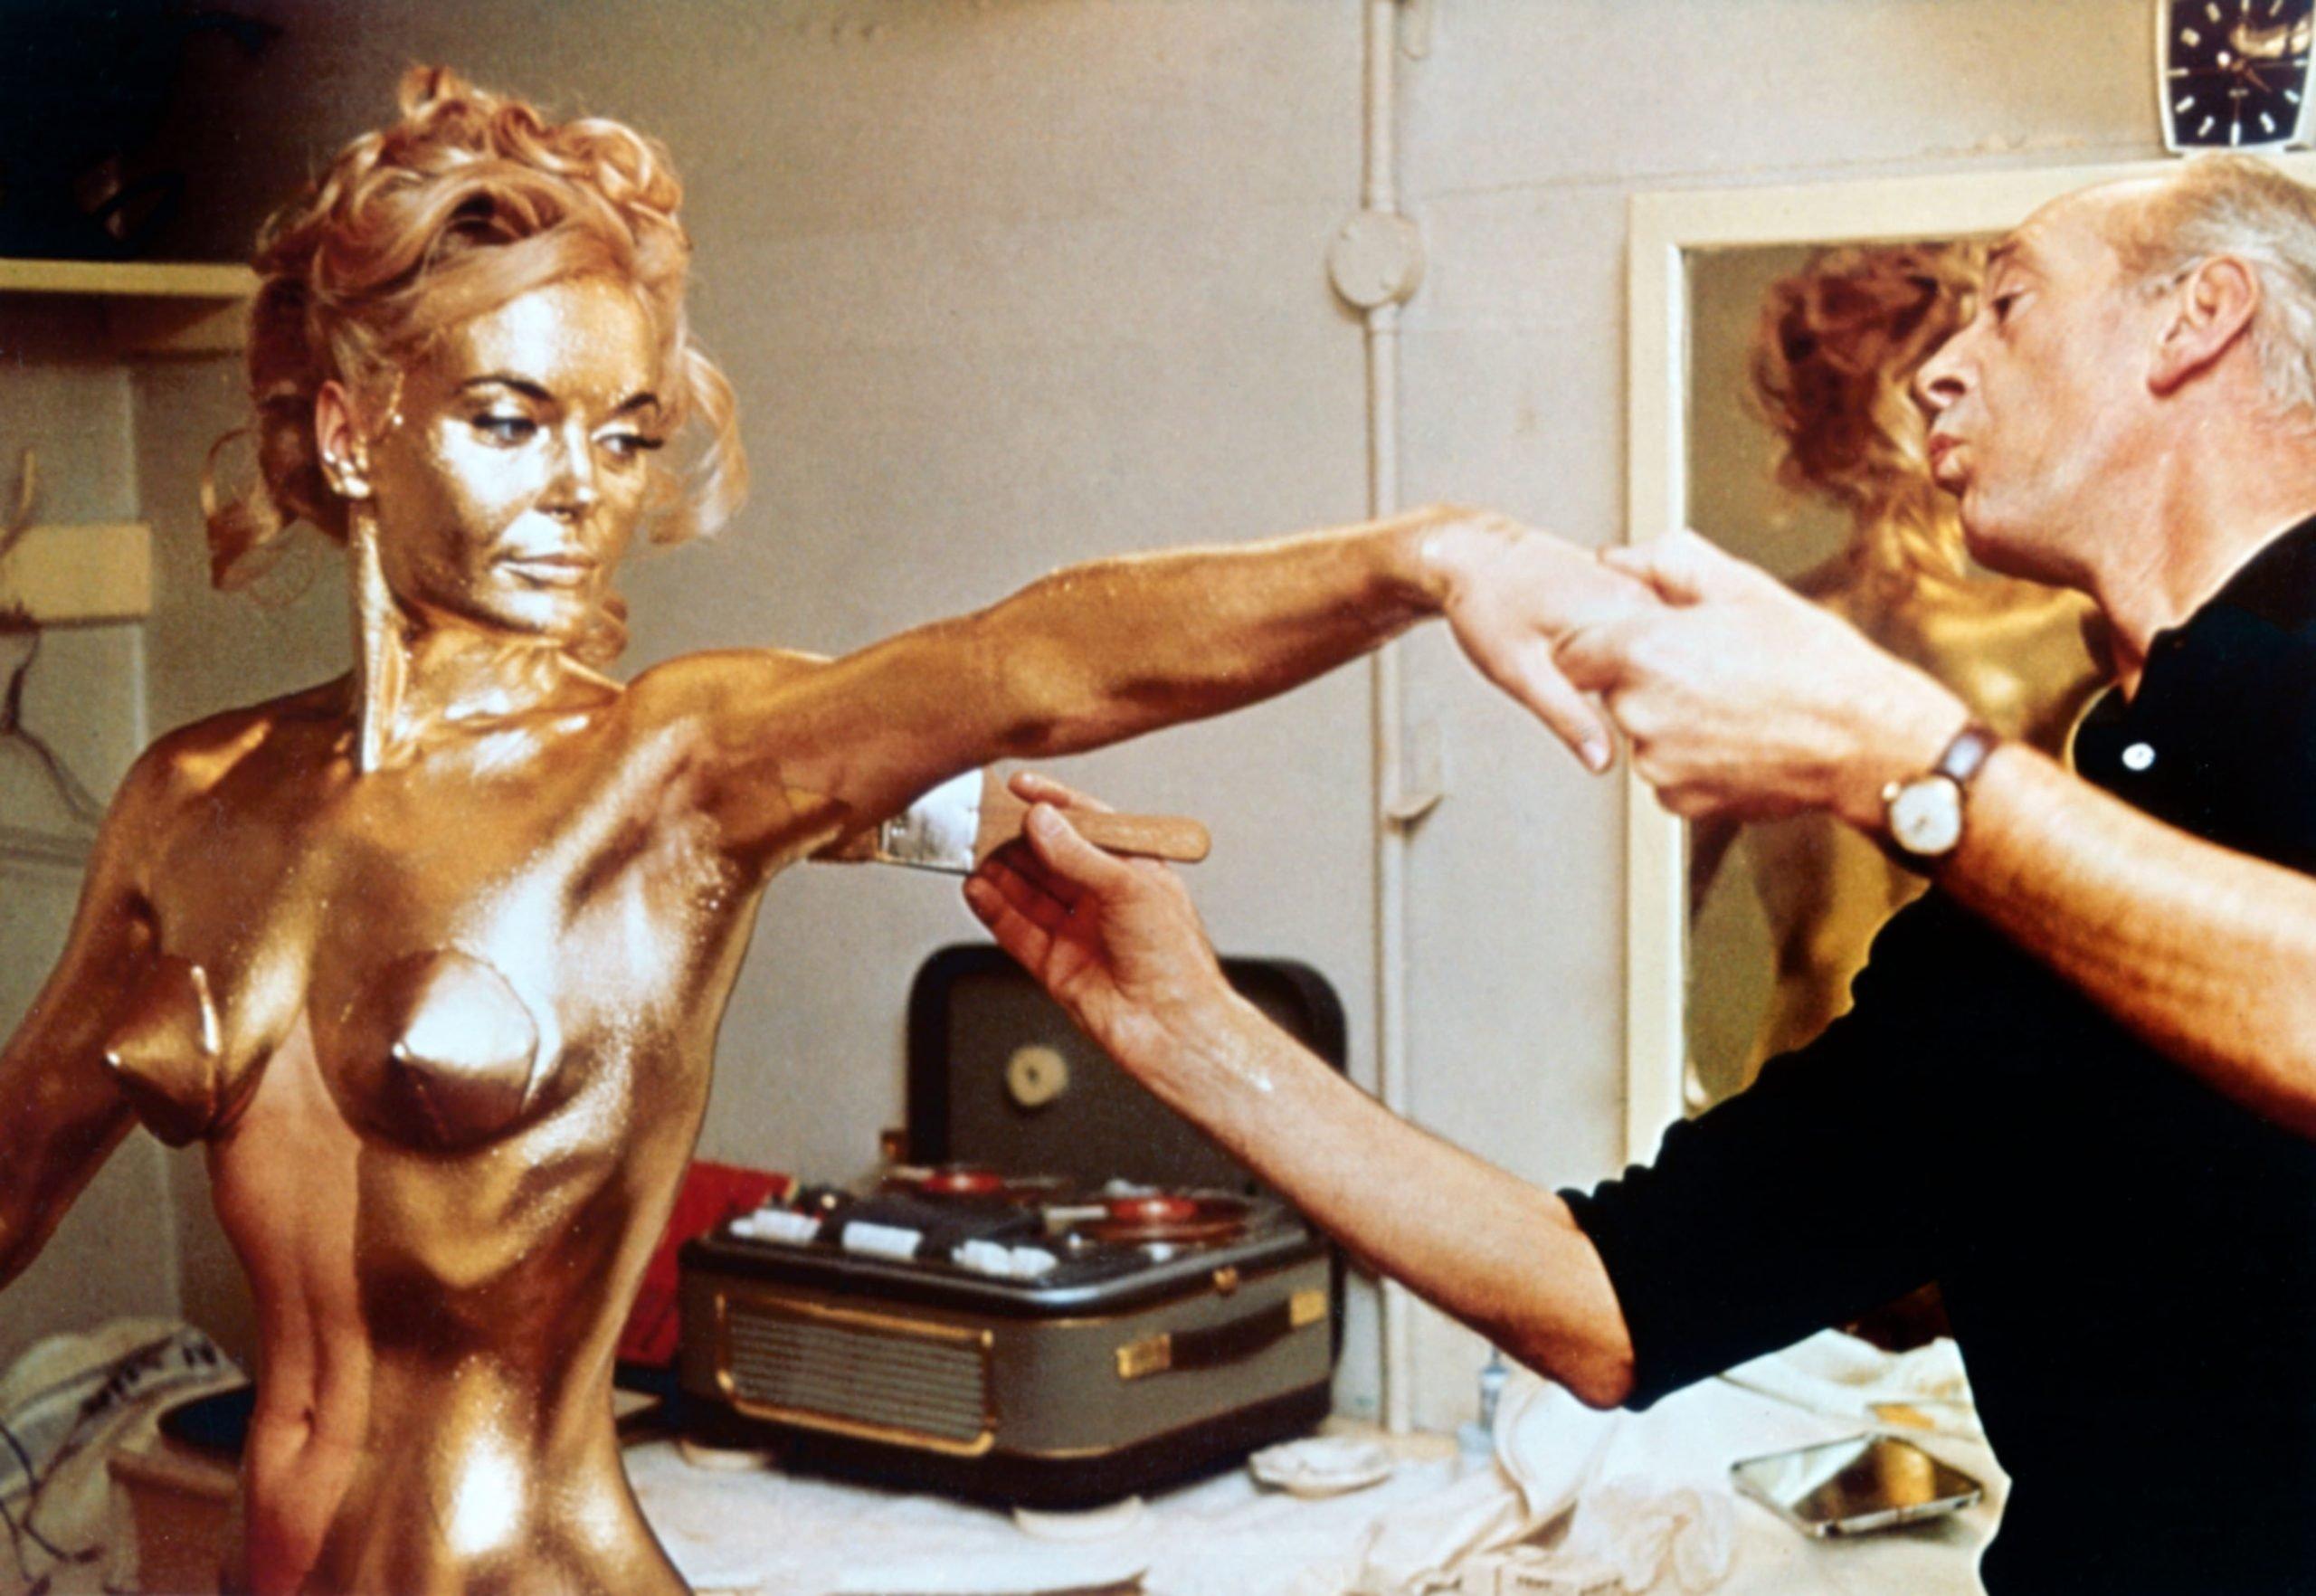 shirley-eaton-in-the-james-bond-film-goldfinger